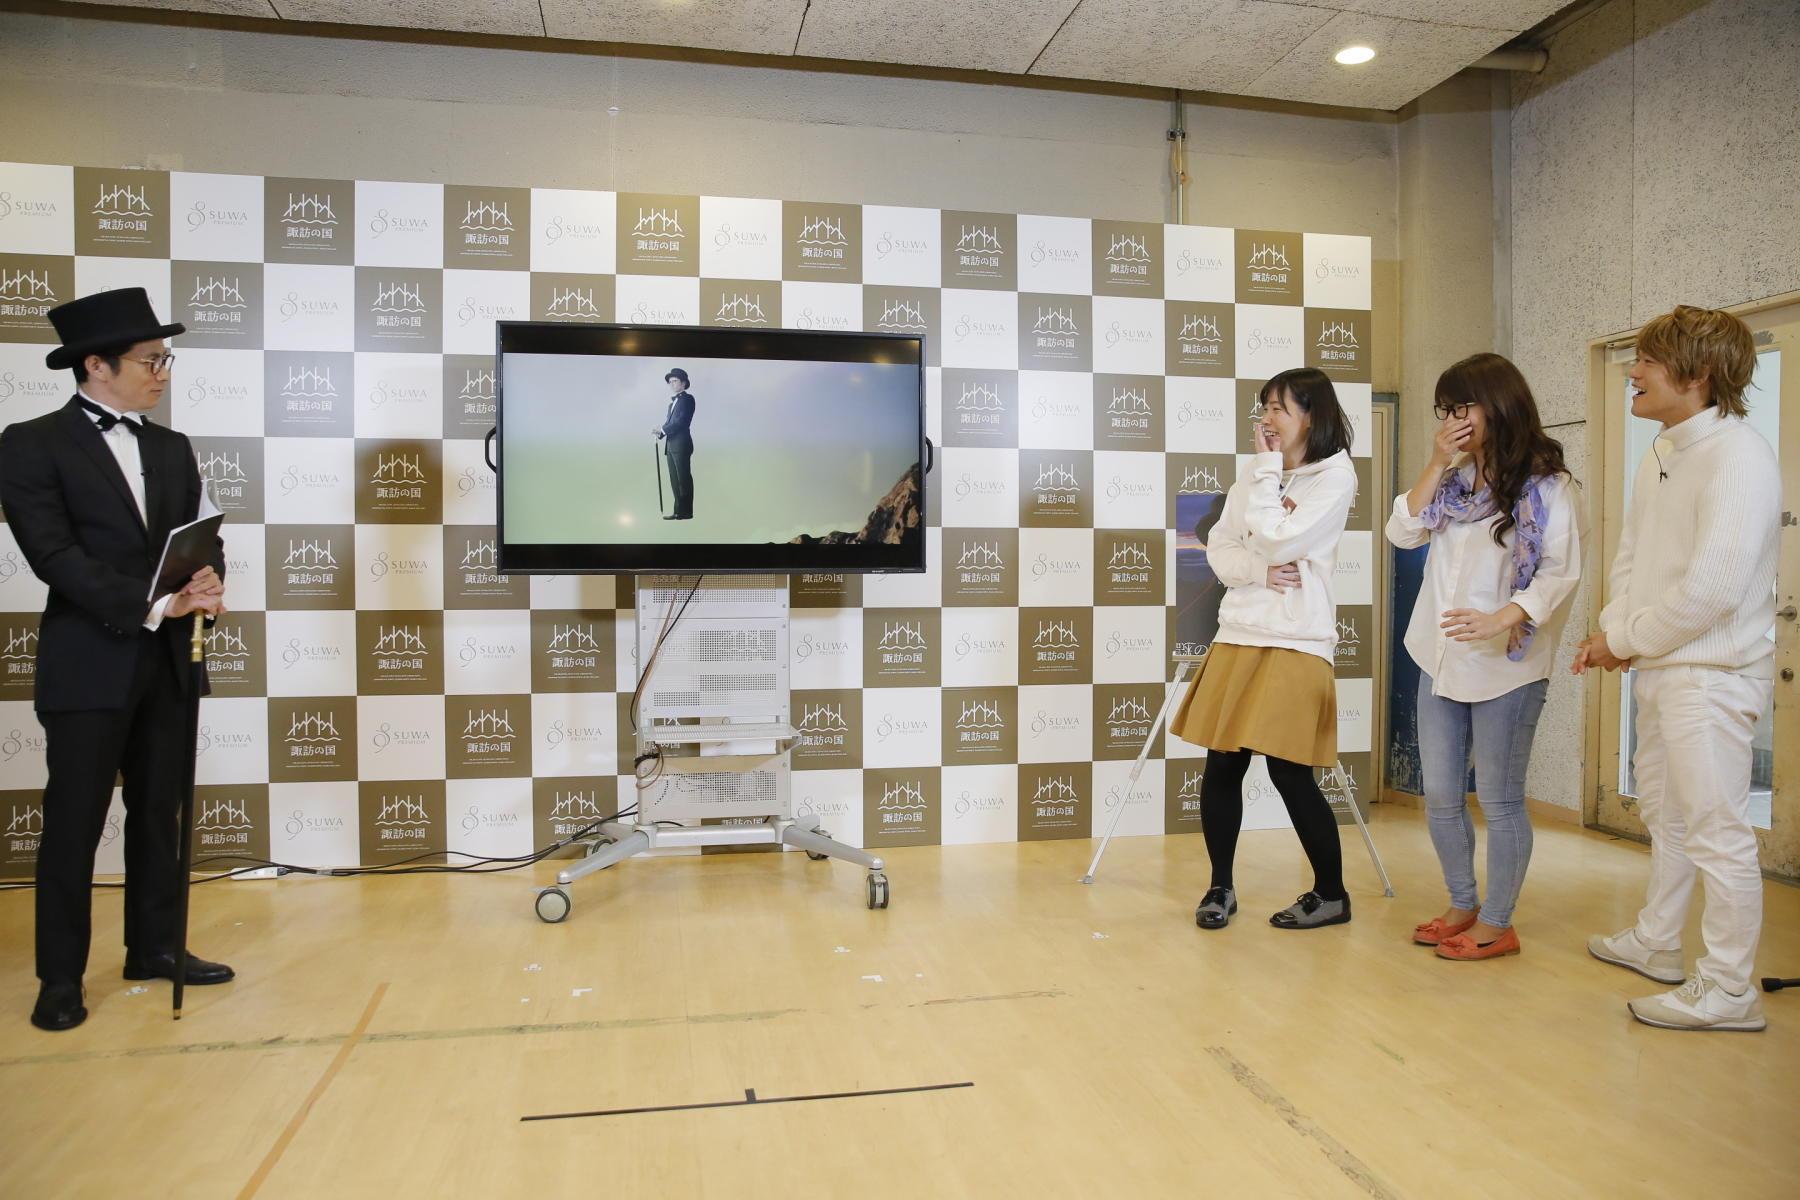 http://news.yoshimoto.co.jp/20171108161525-aee818219ff273367dfc326d12d3a693204be8f4.jpg